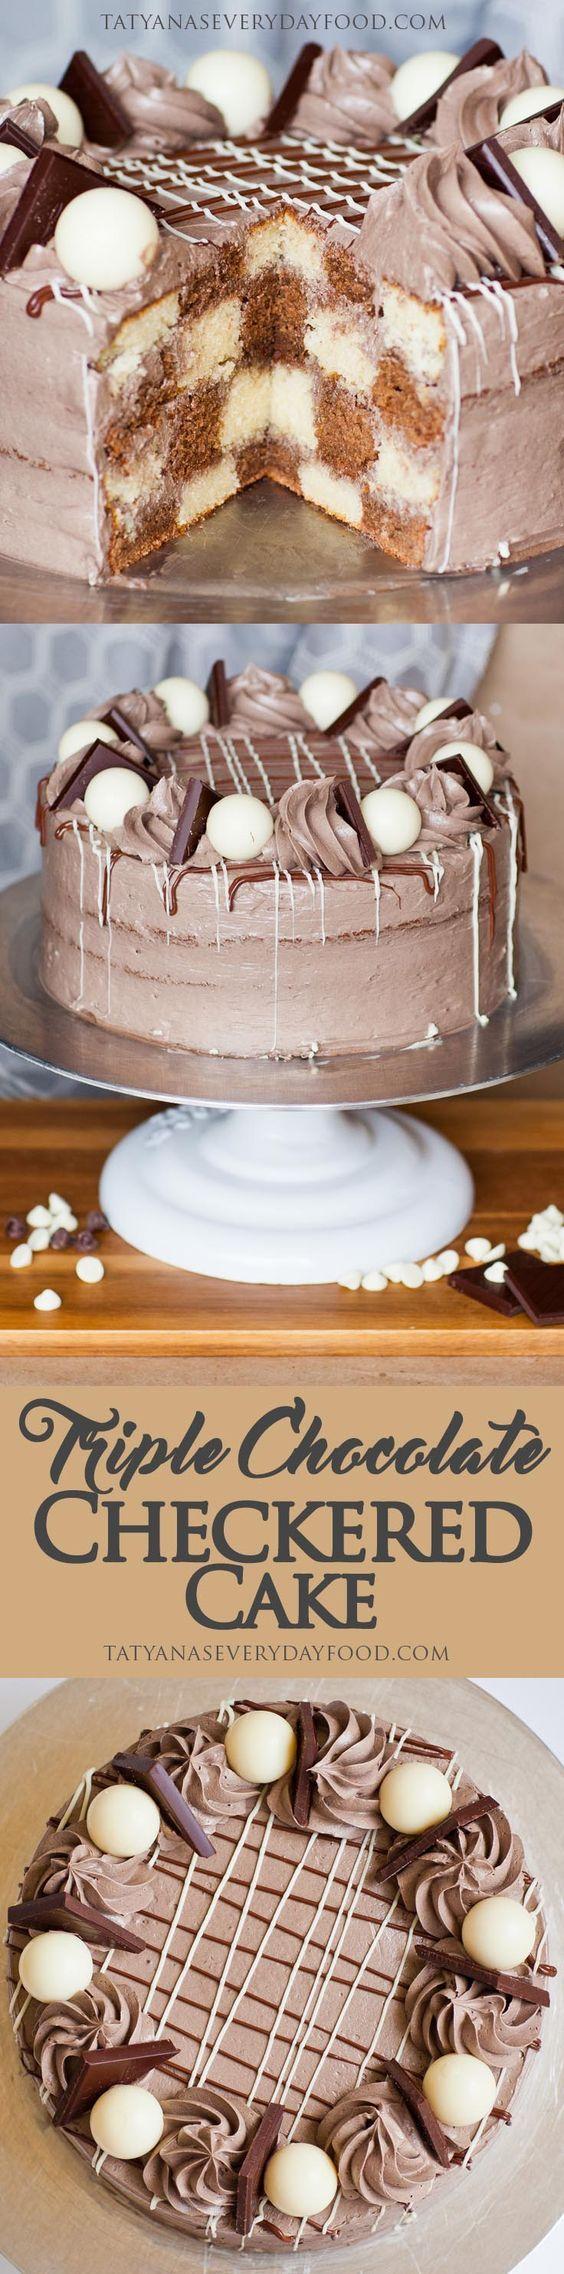 Triple Chocolate Checkered Cake - Tatyanas Everyday Food